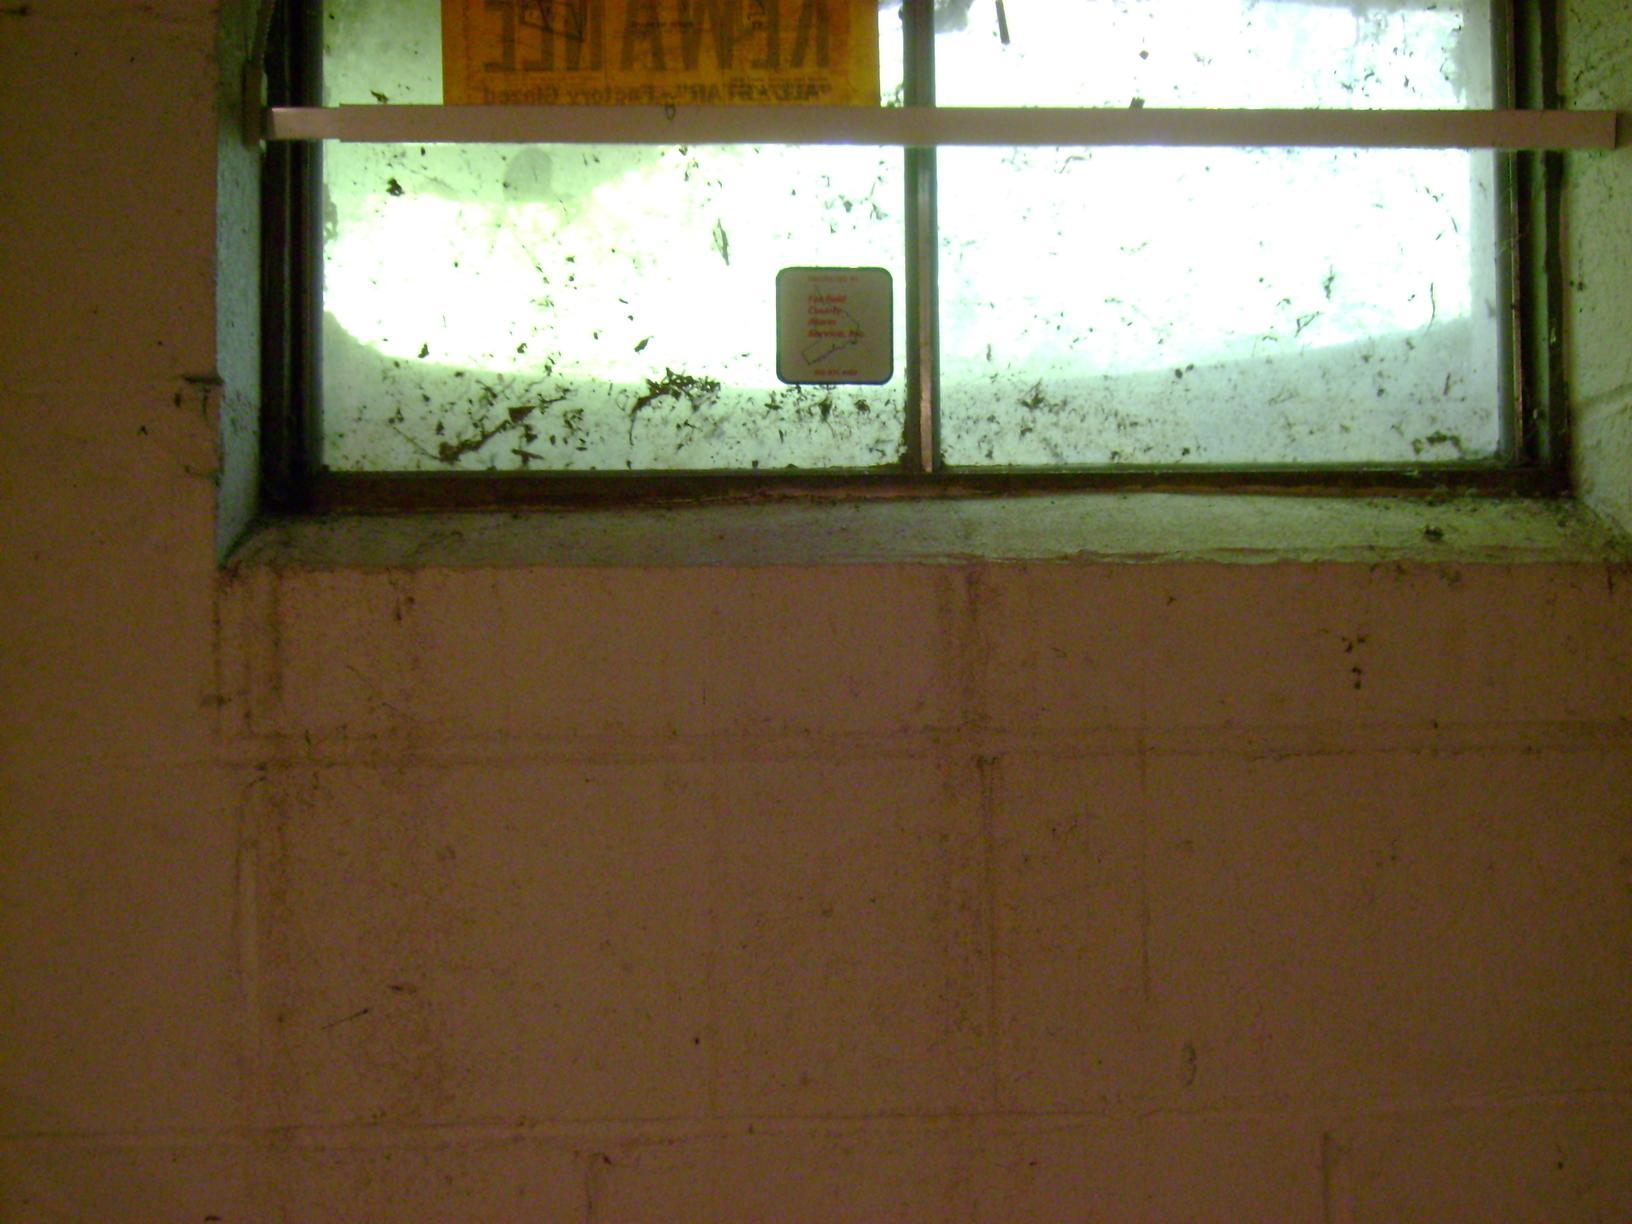 Leaky Window in Redding, CT